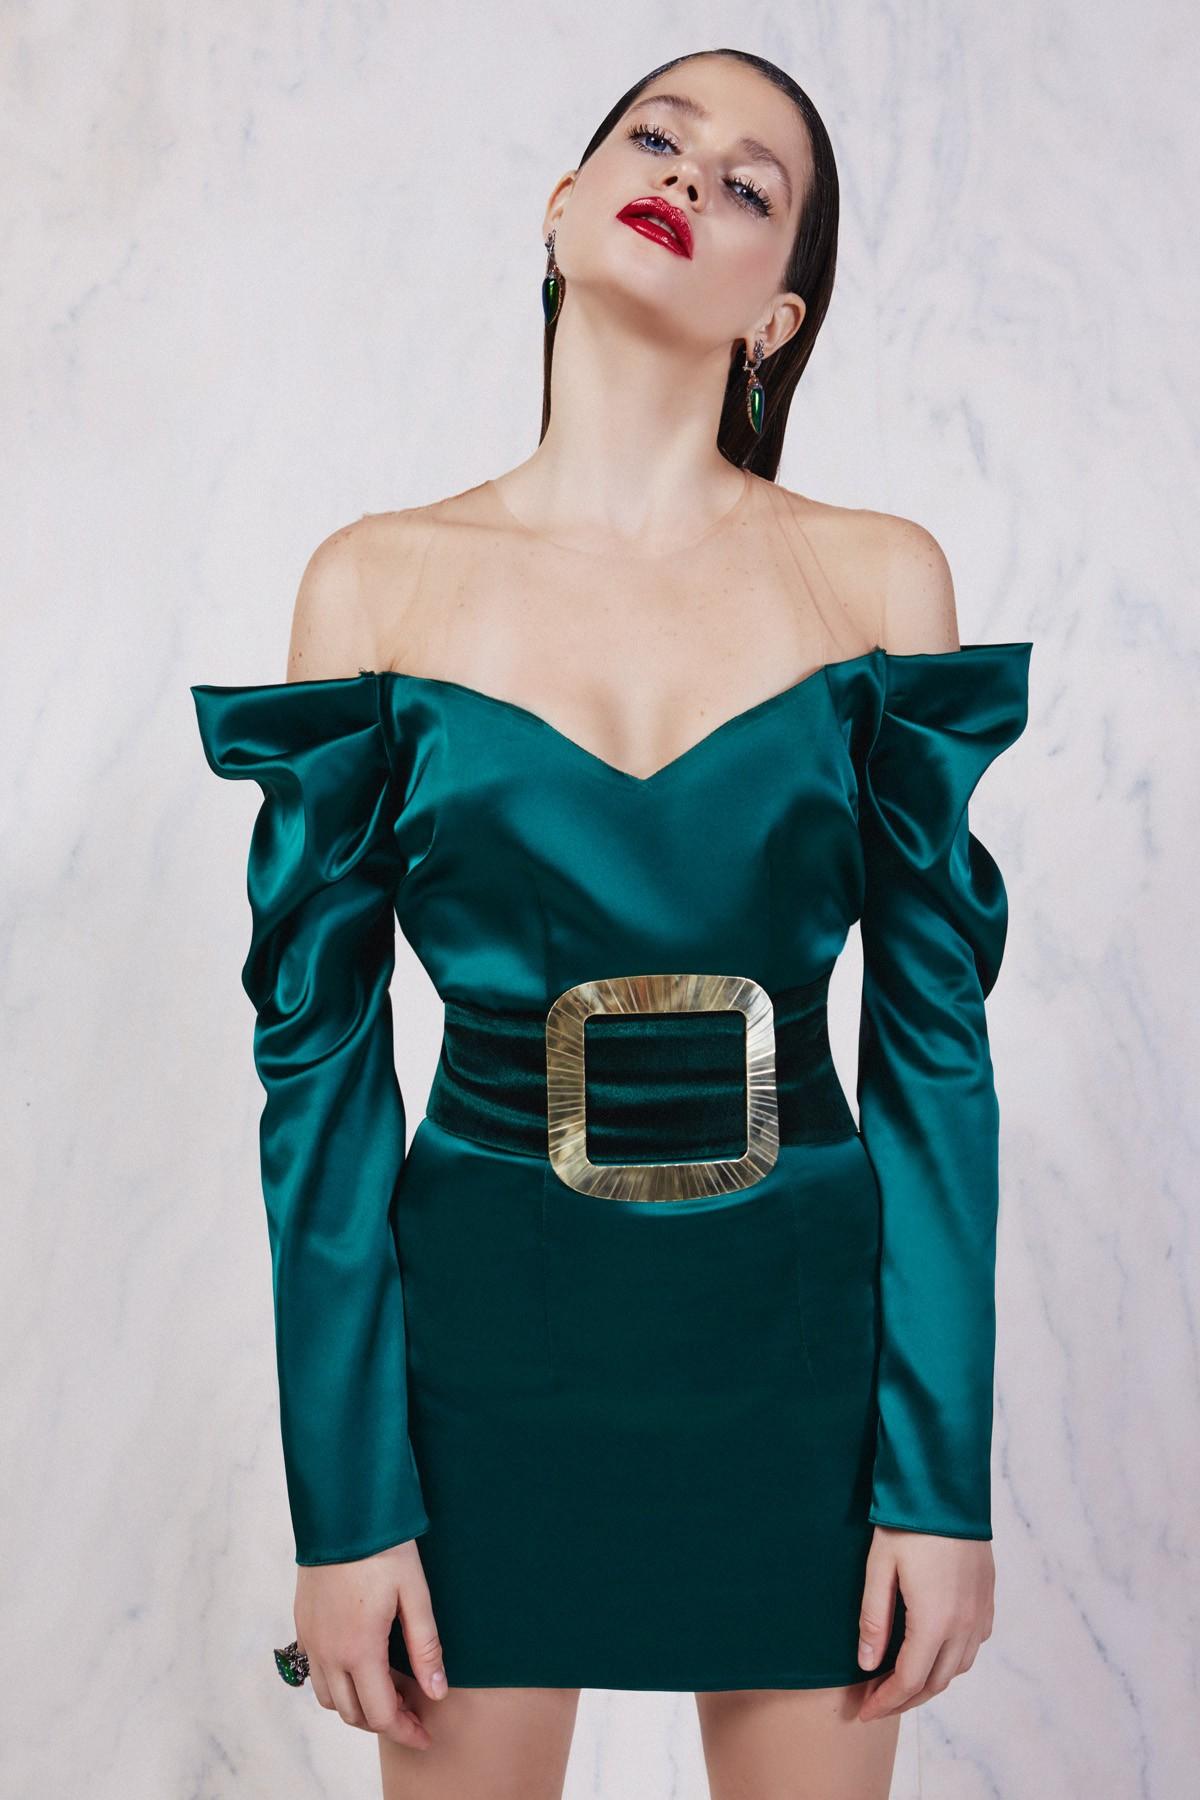 9-rochie-lauren-cristina-savulescu-20-de-idei-de-rochii-pentru-craciun-fabulous-muses